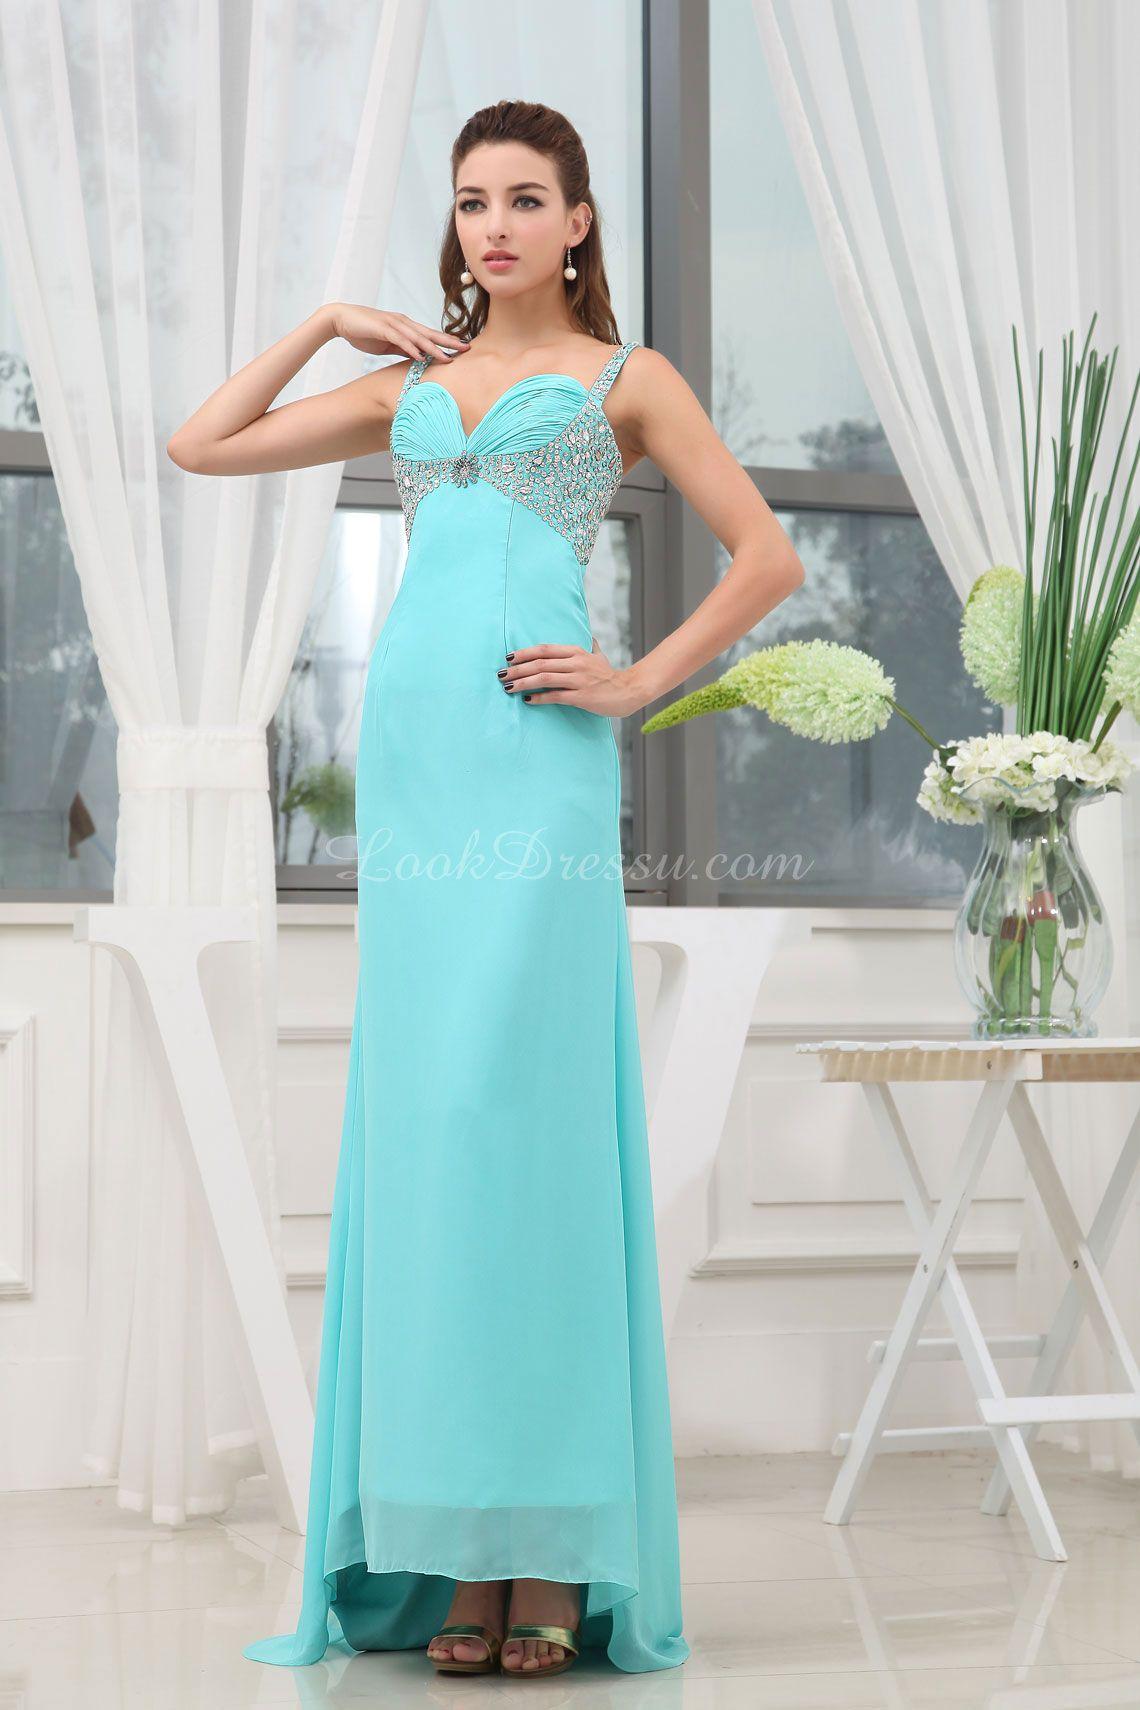 Prom dress prom dress prom dress prom dress pinterest